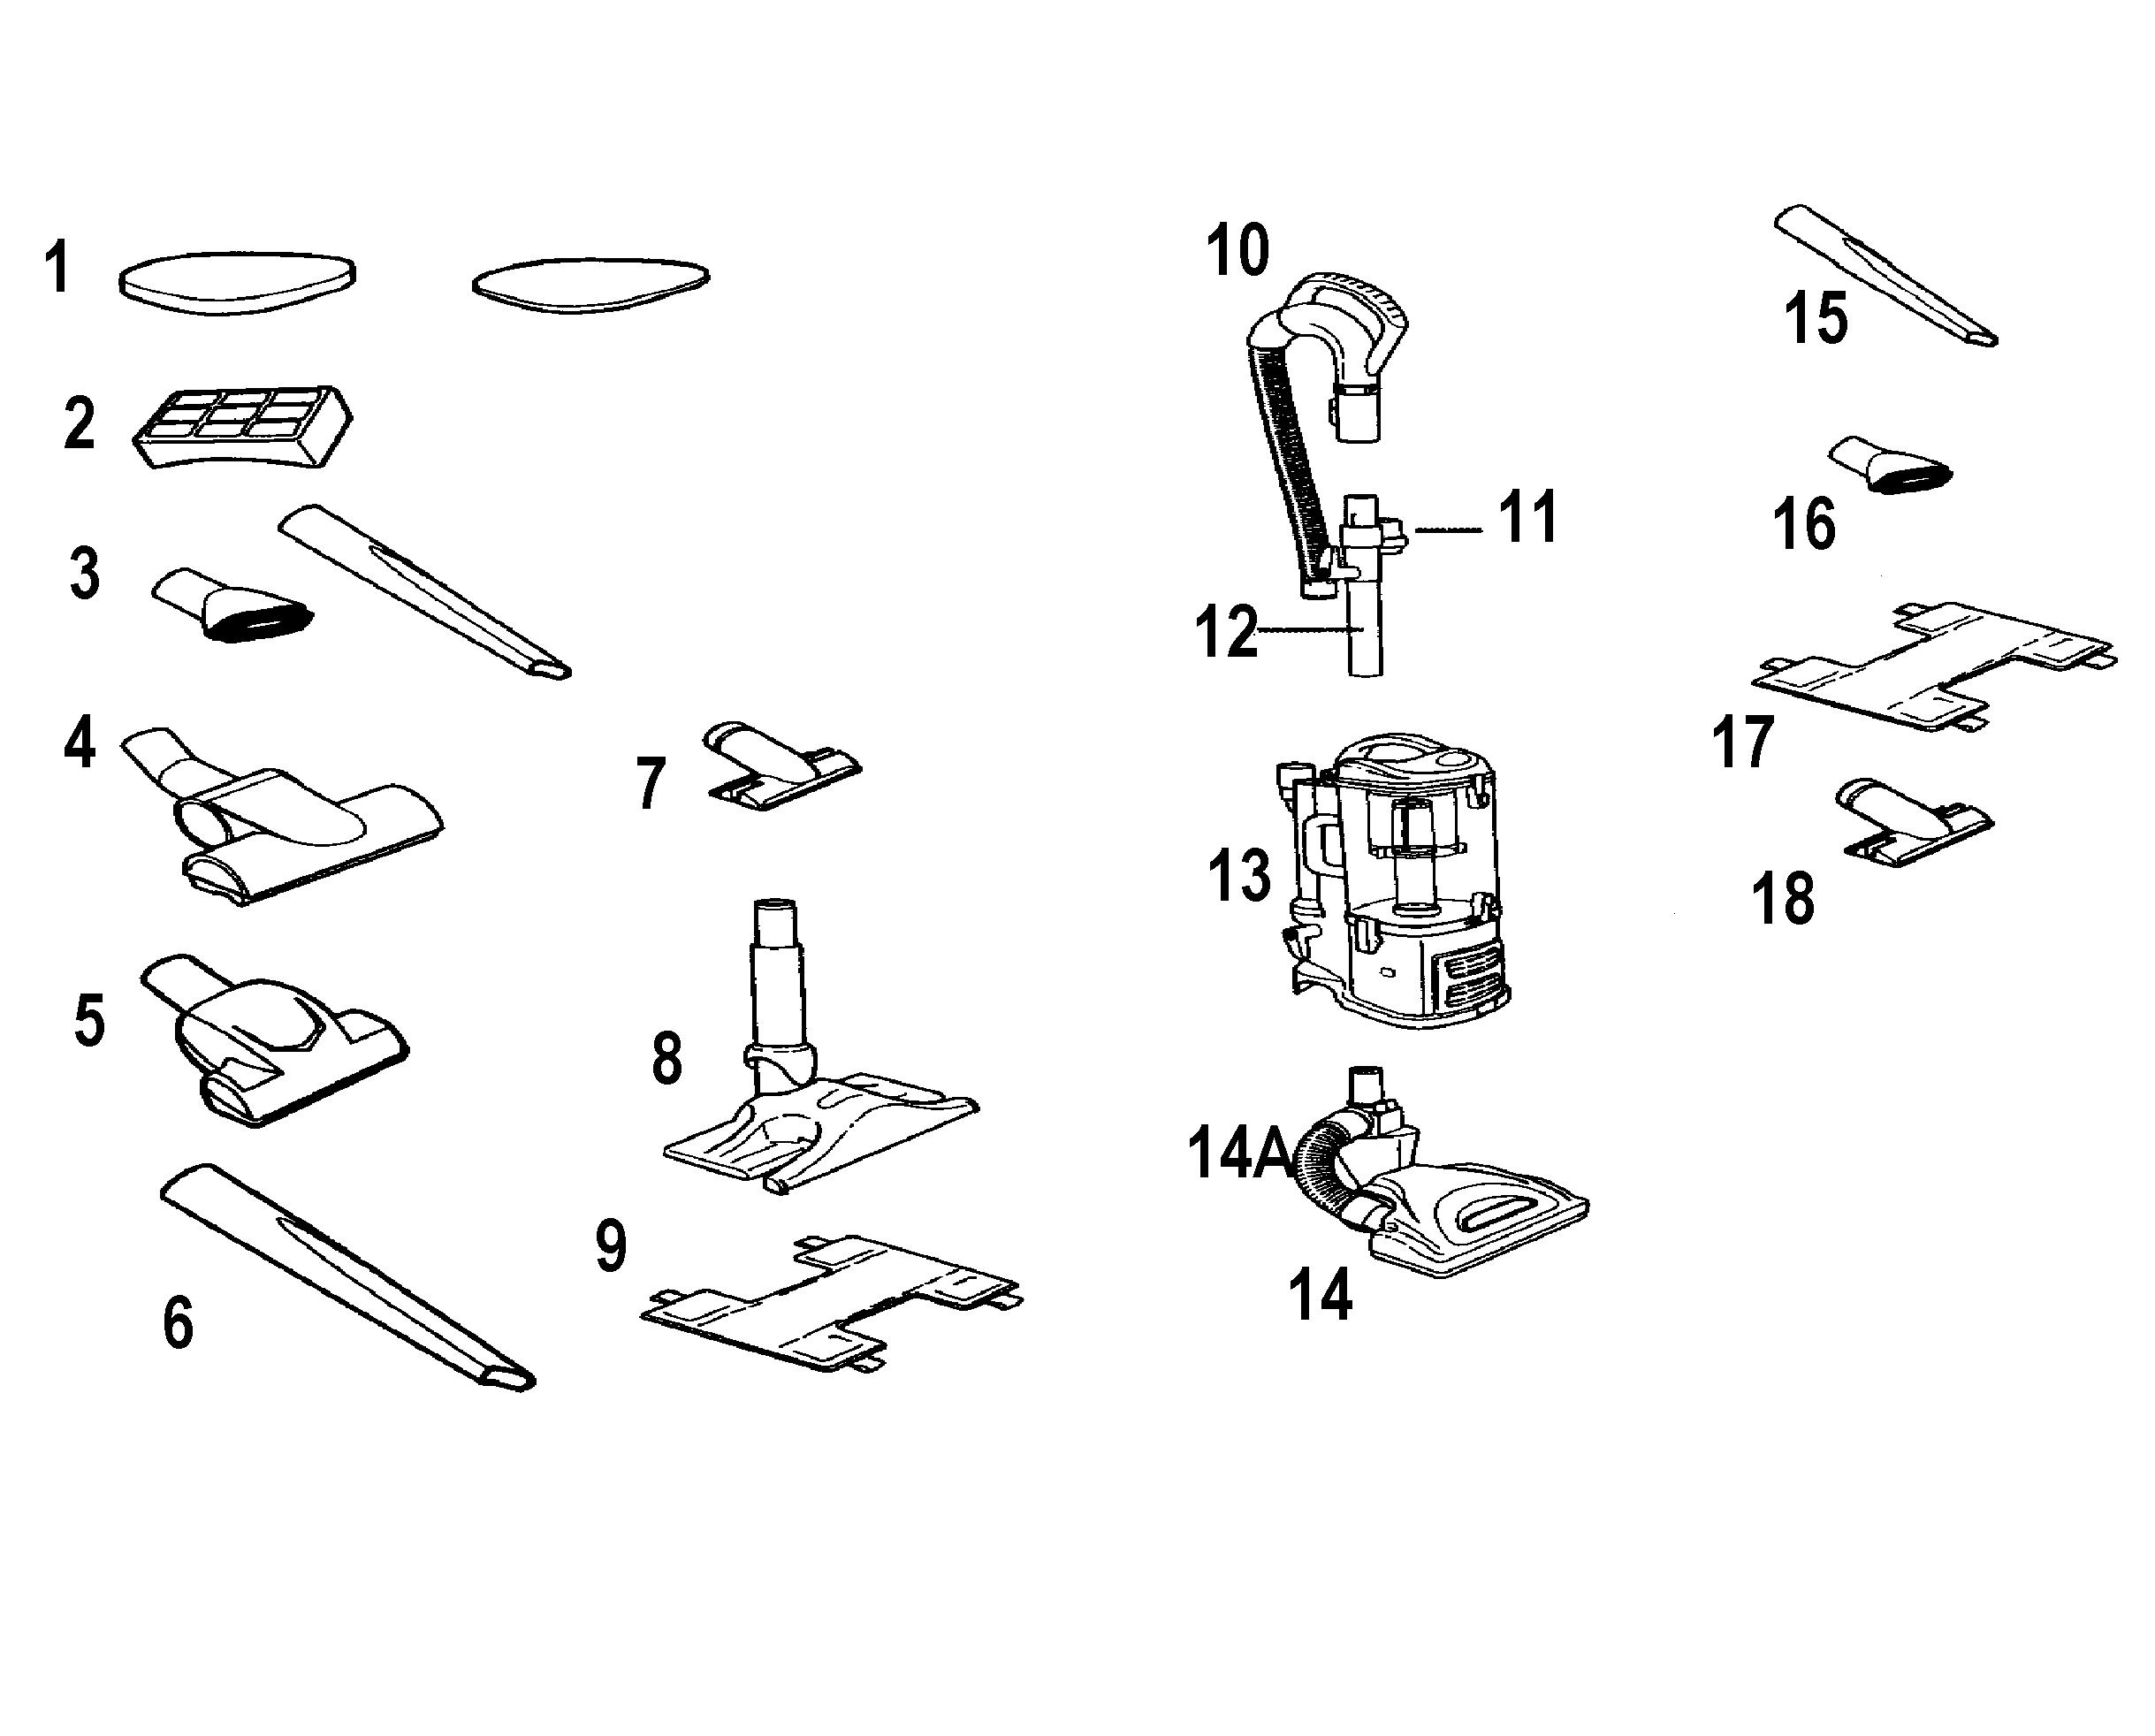 Vacuum Parts Shark Vacuum Parts